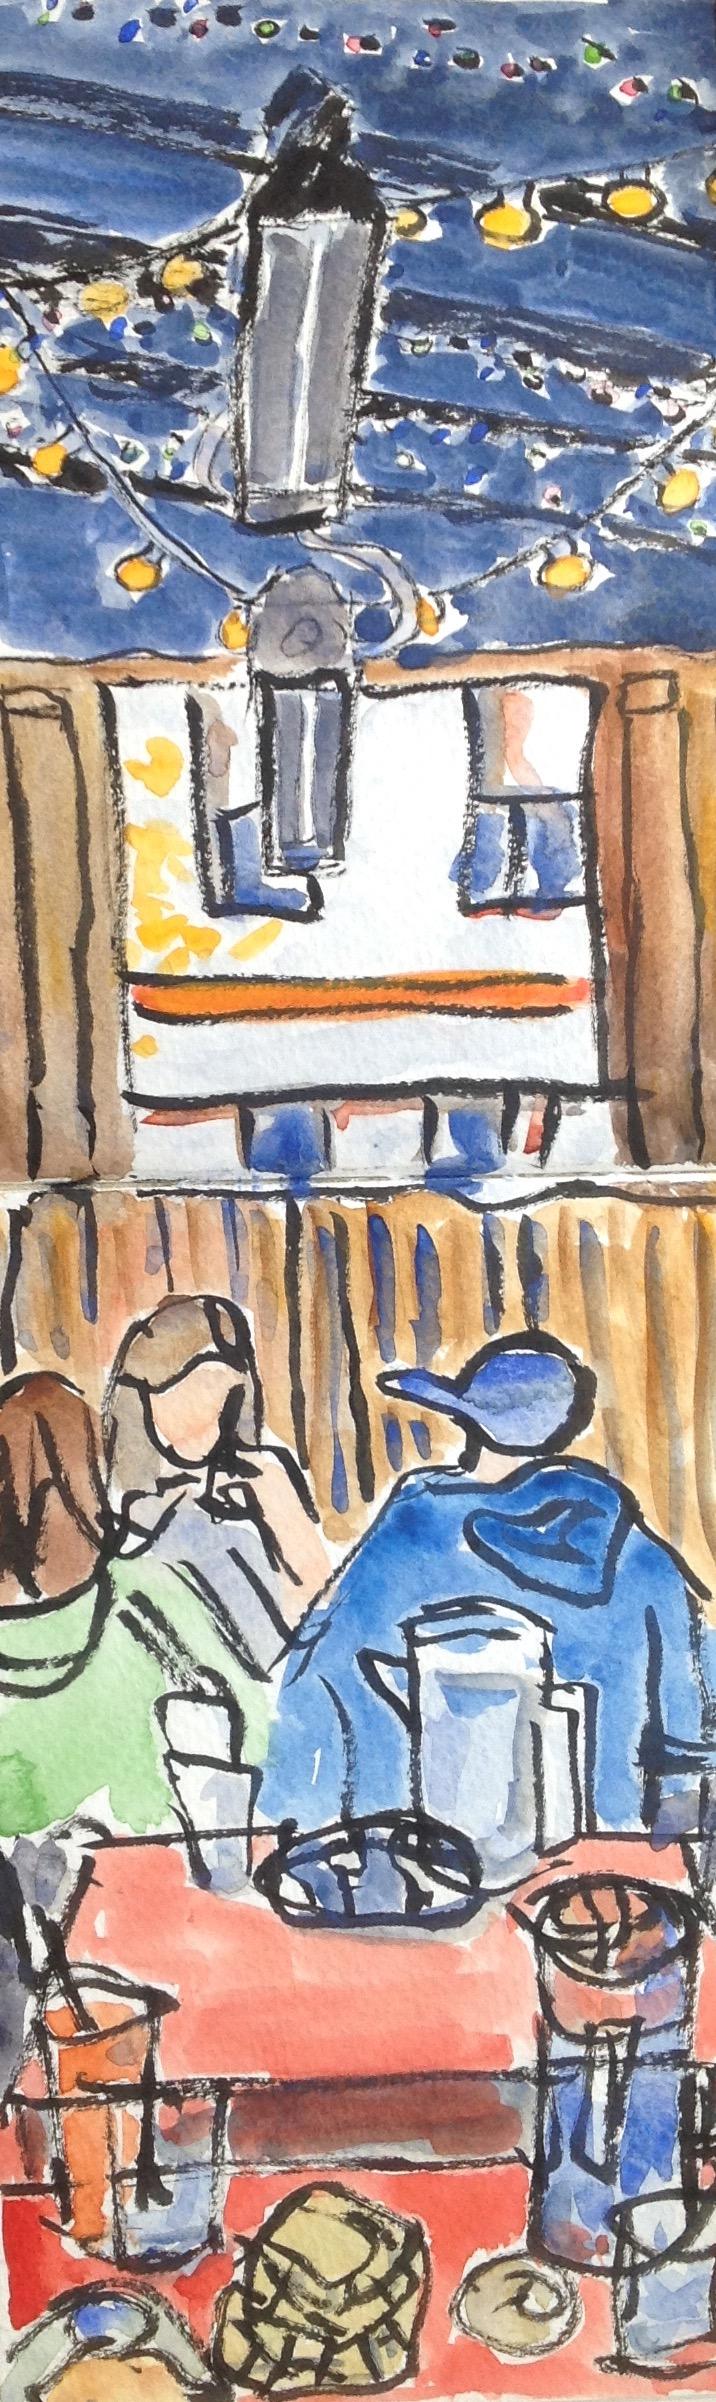 Restaurant sketch.JPG